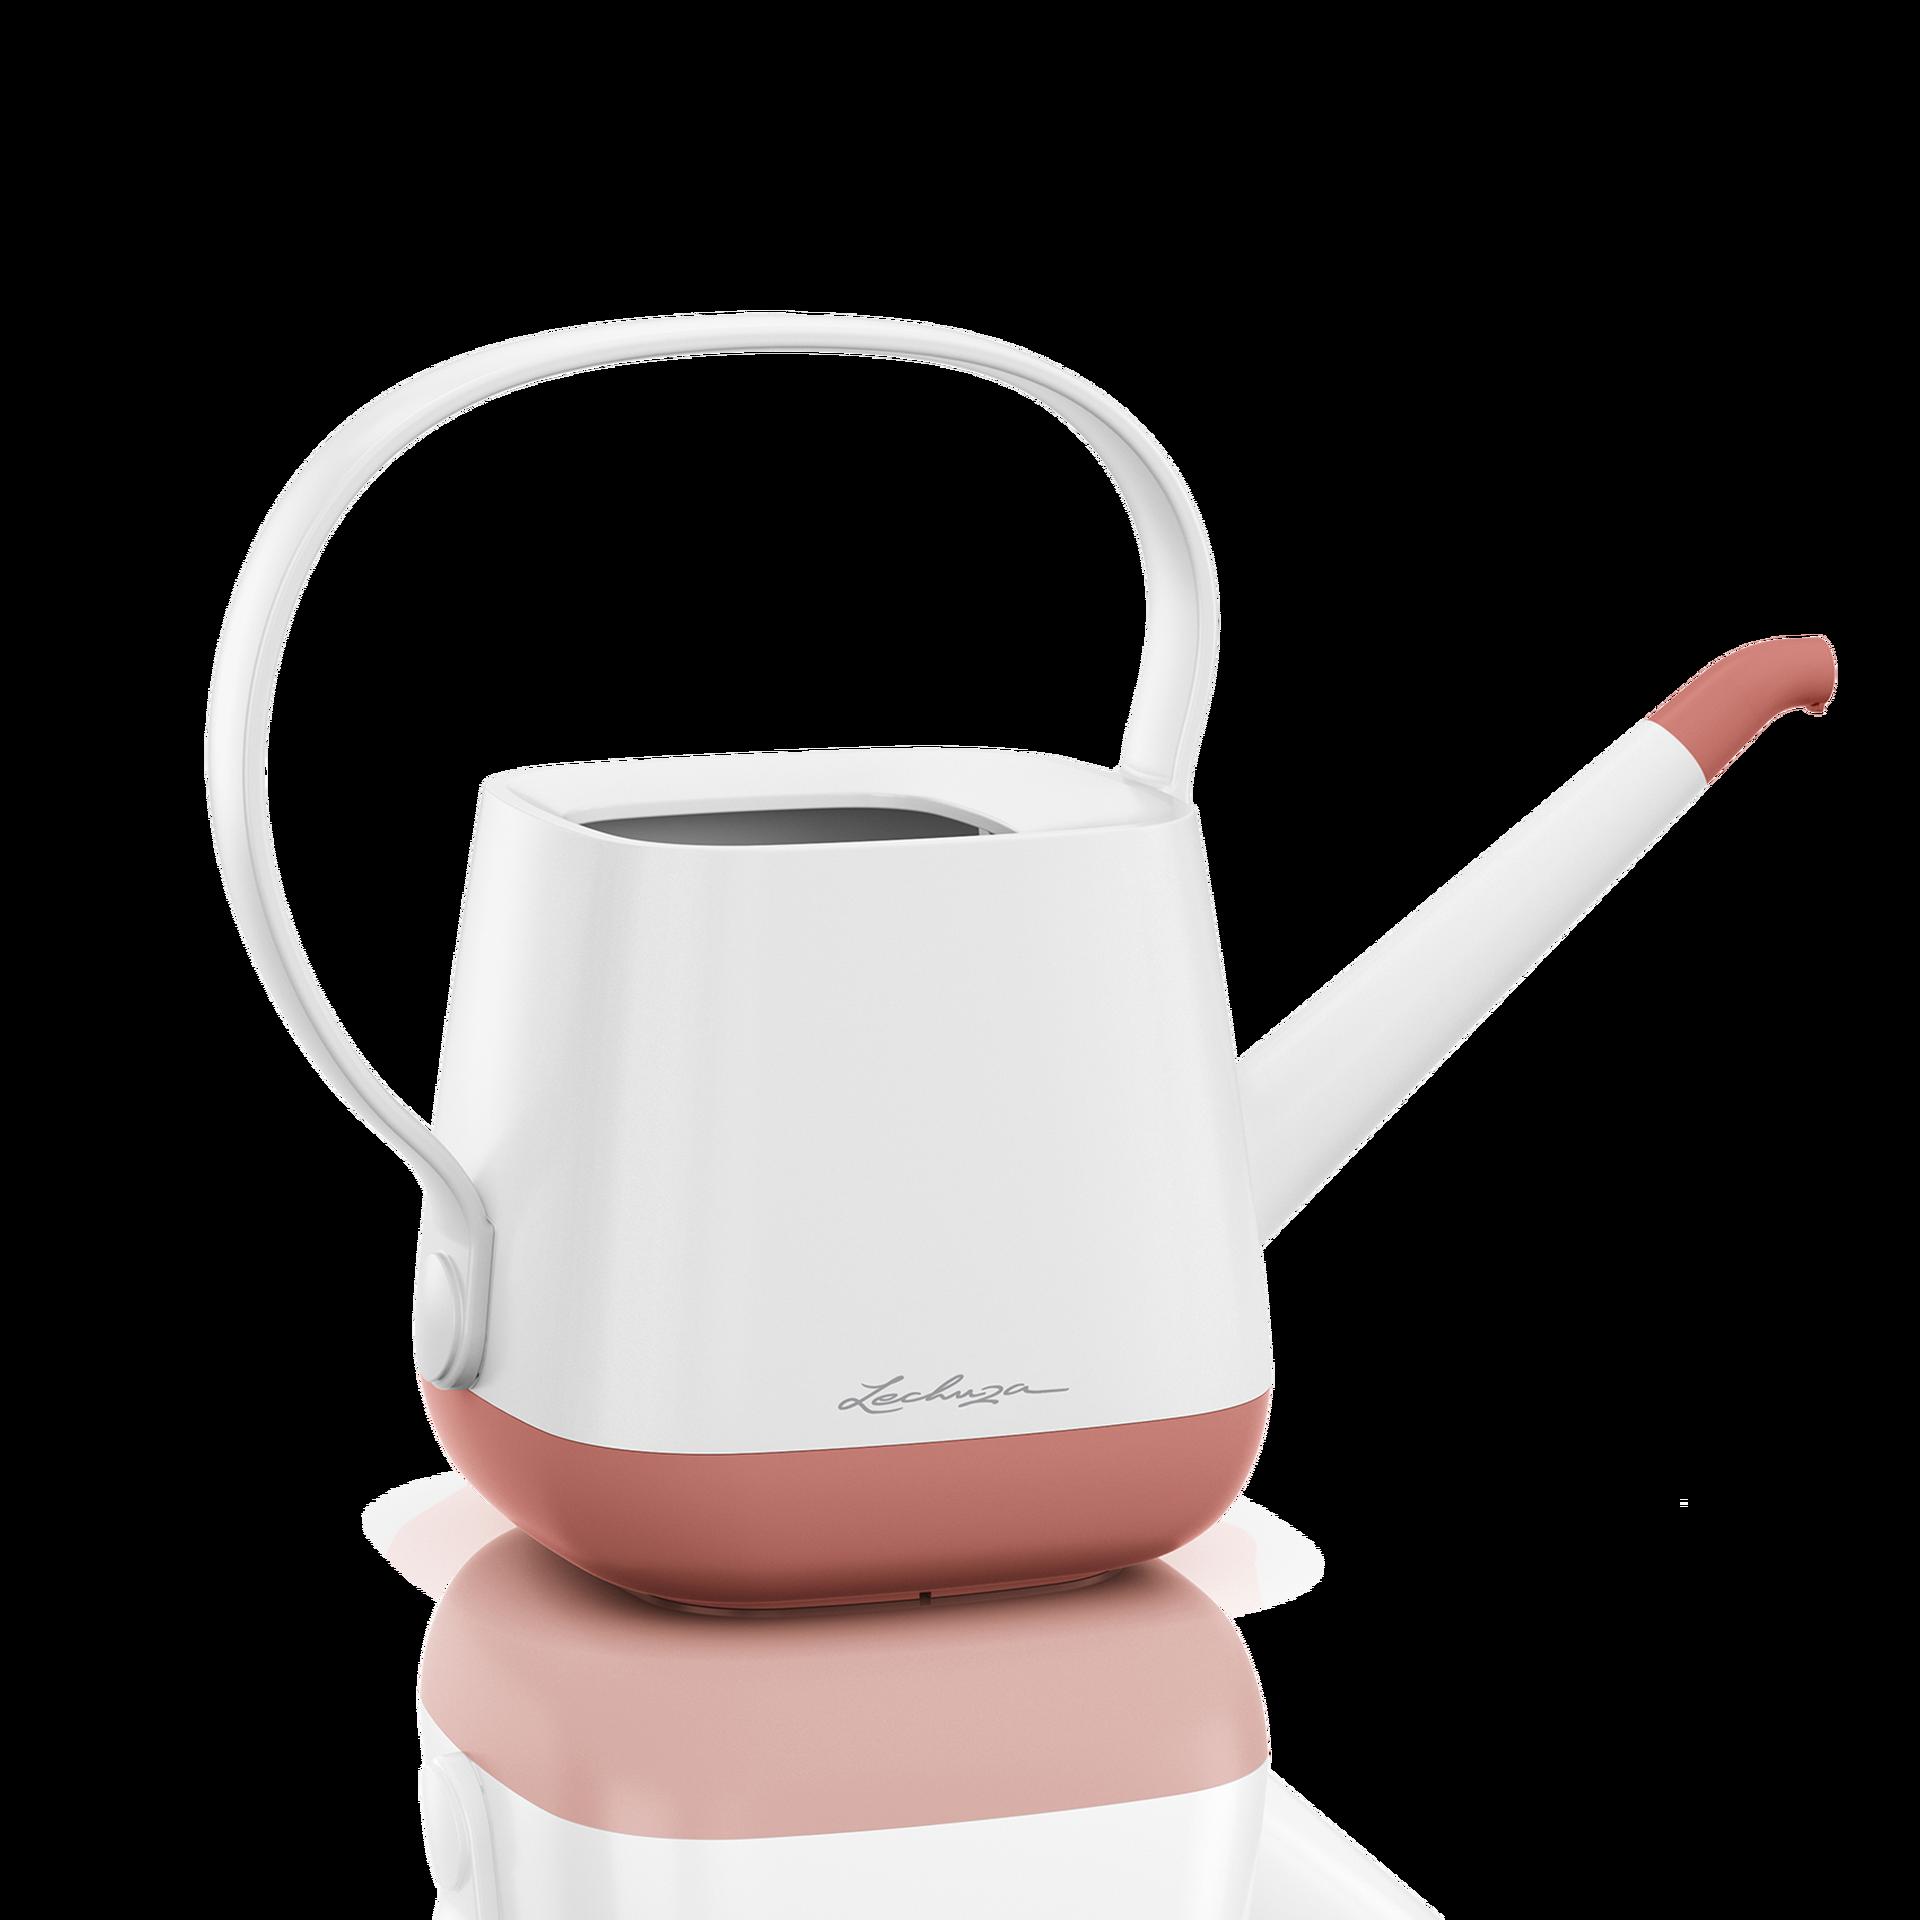 YULA watering can white/pearl rose semi-gloss